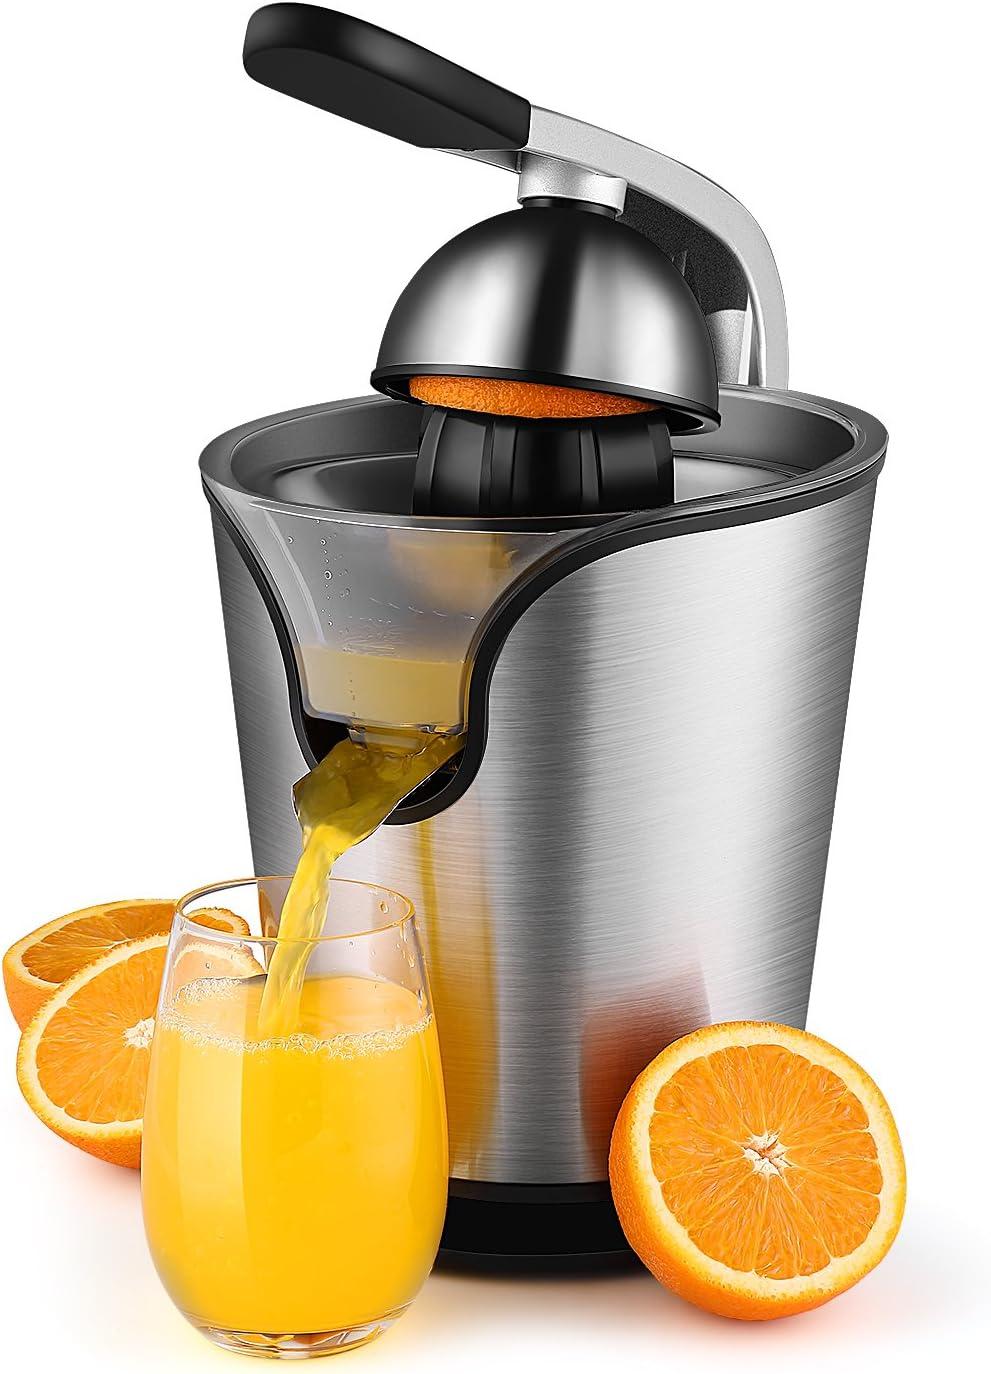 Hand Press Electric Citrus Orange Juicer Squeezer Machine - Motorized Pulp Control 160 Watt Juice Maker Extractor - Ergonomic Design Stainless Steel Stand with Rubber Handle and Cone Lid